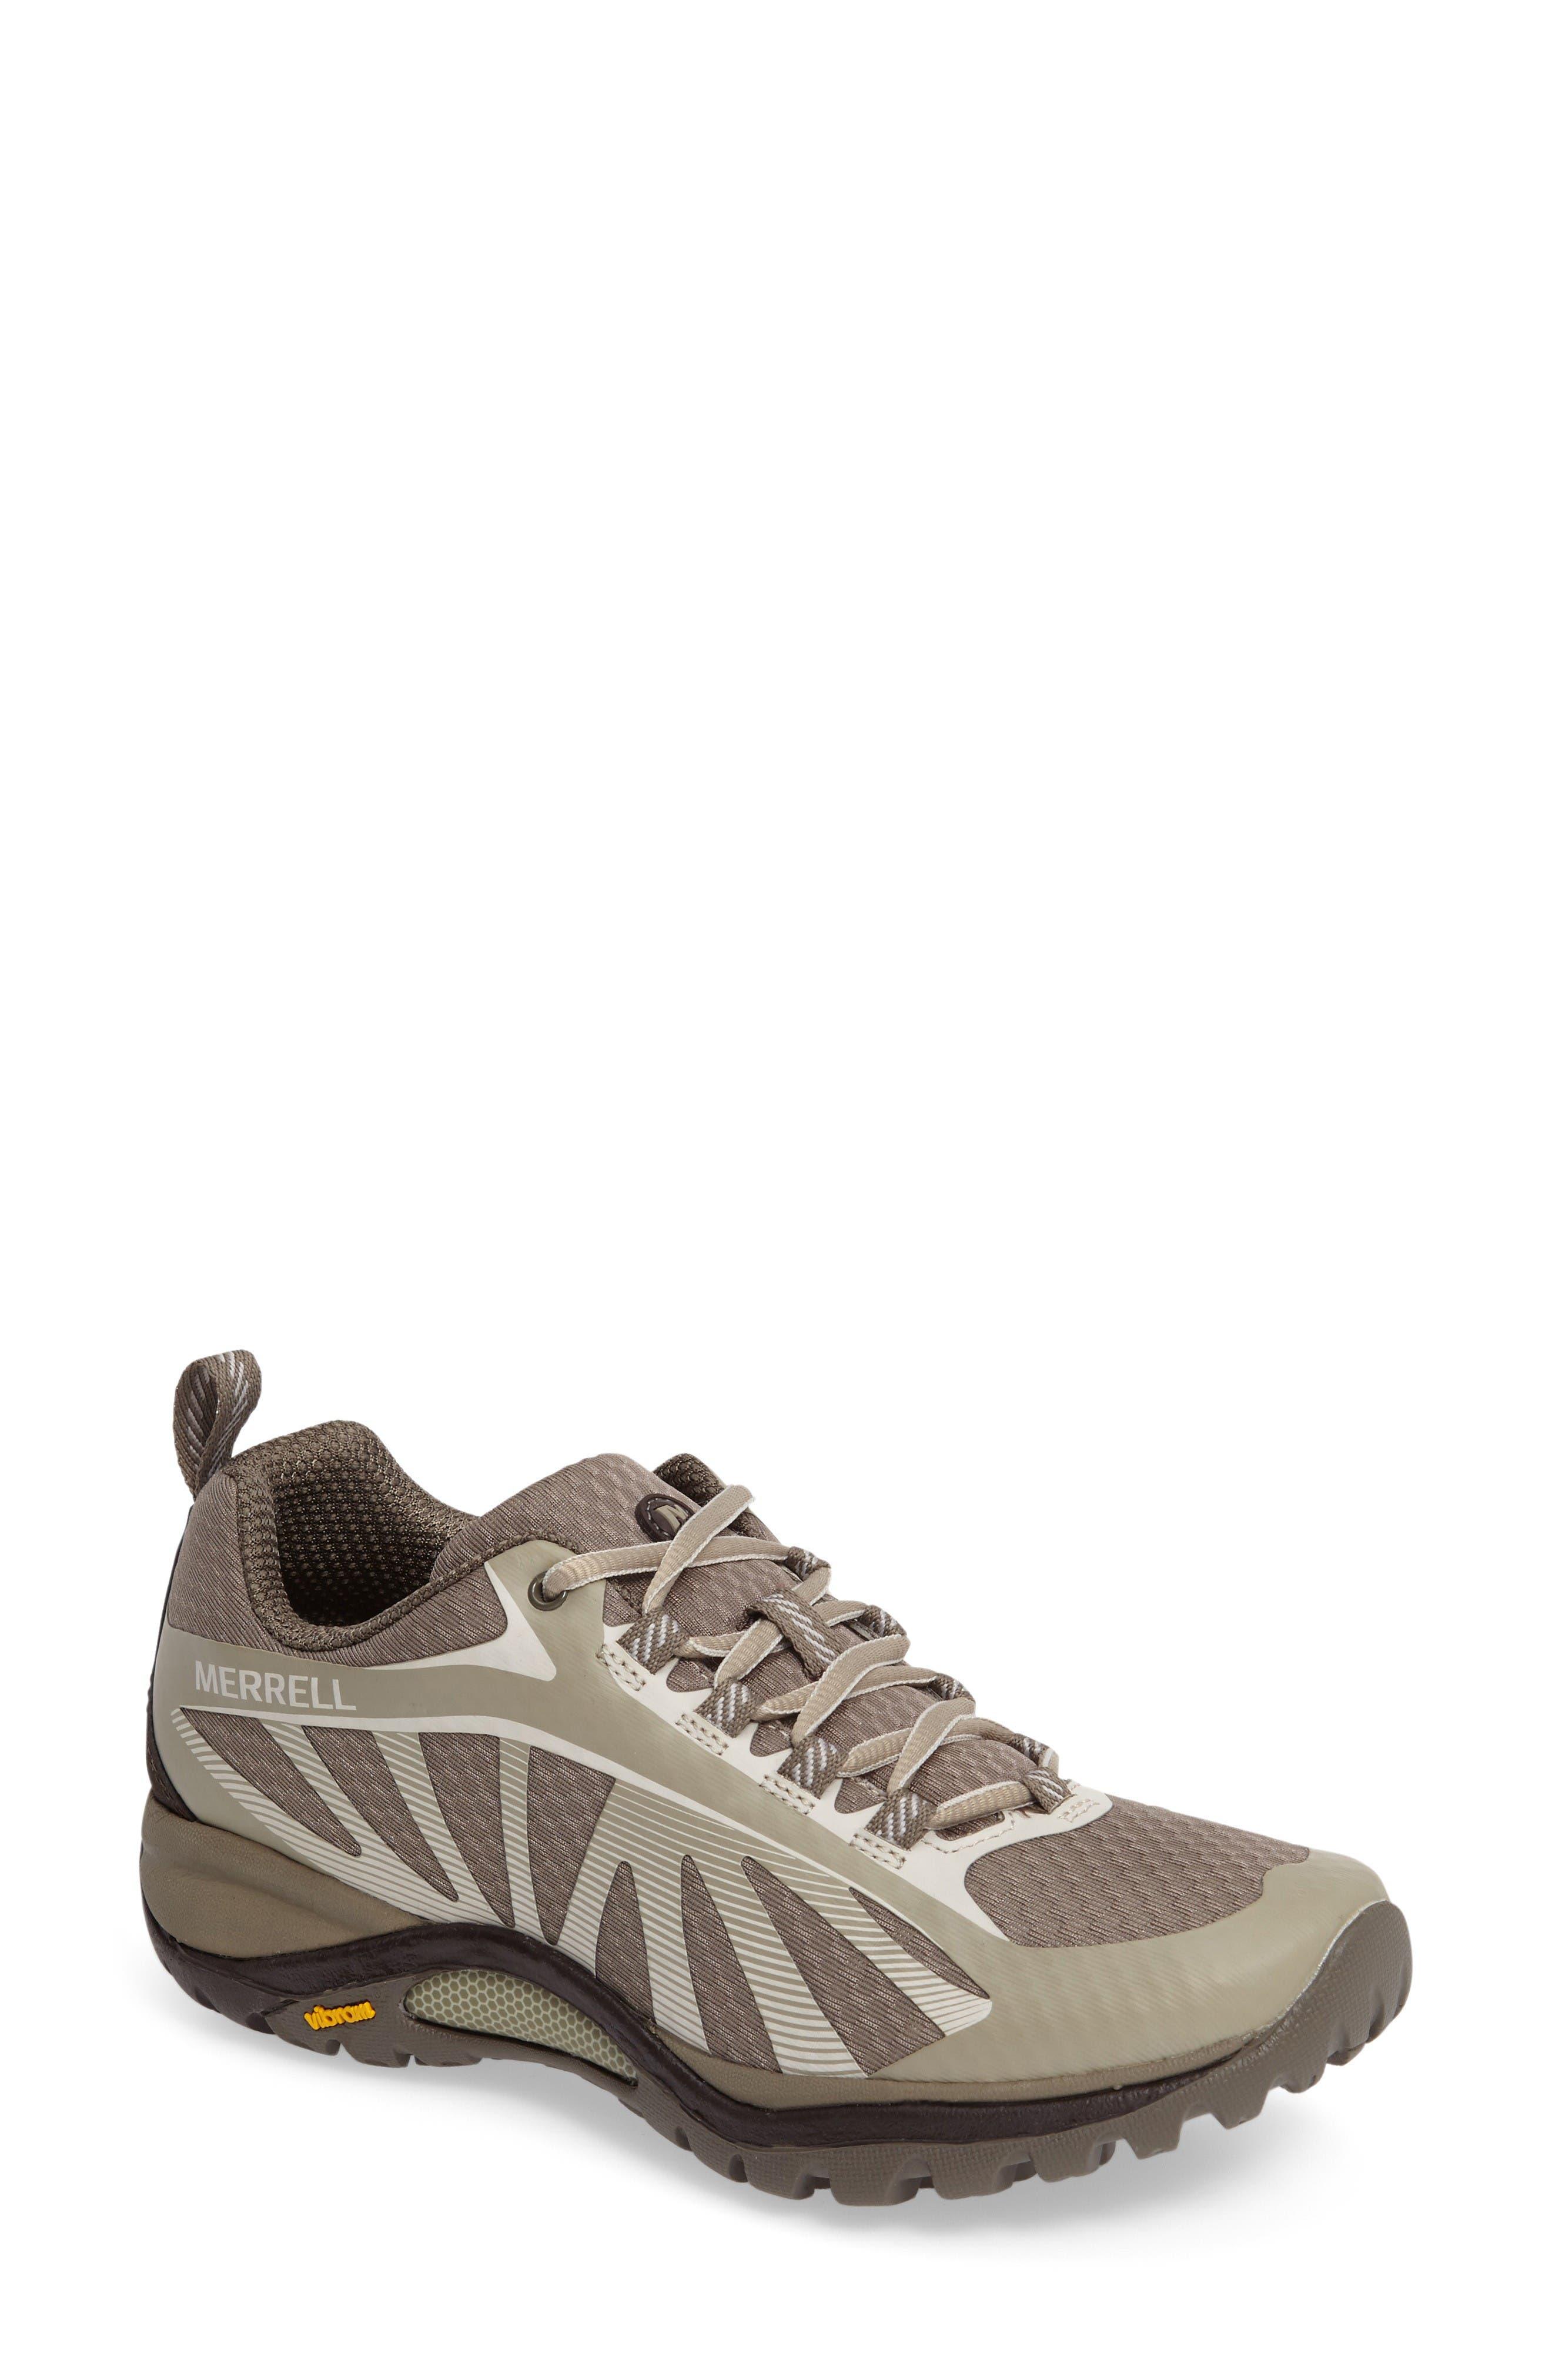 Main Image - Merrell 'Siren Edge' Hiking Shoe (Women)